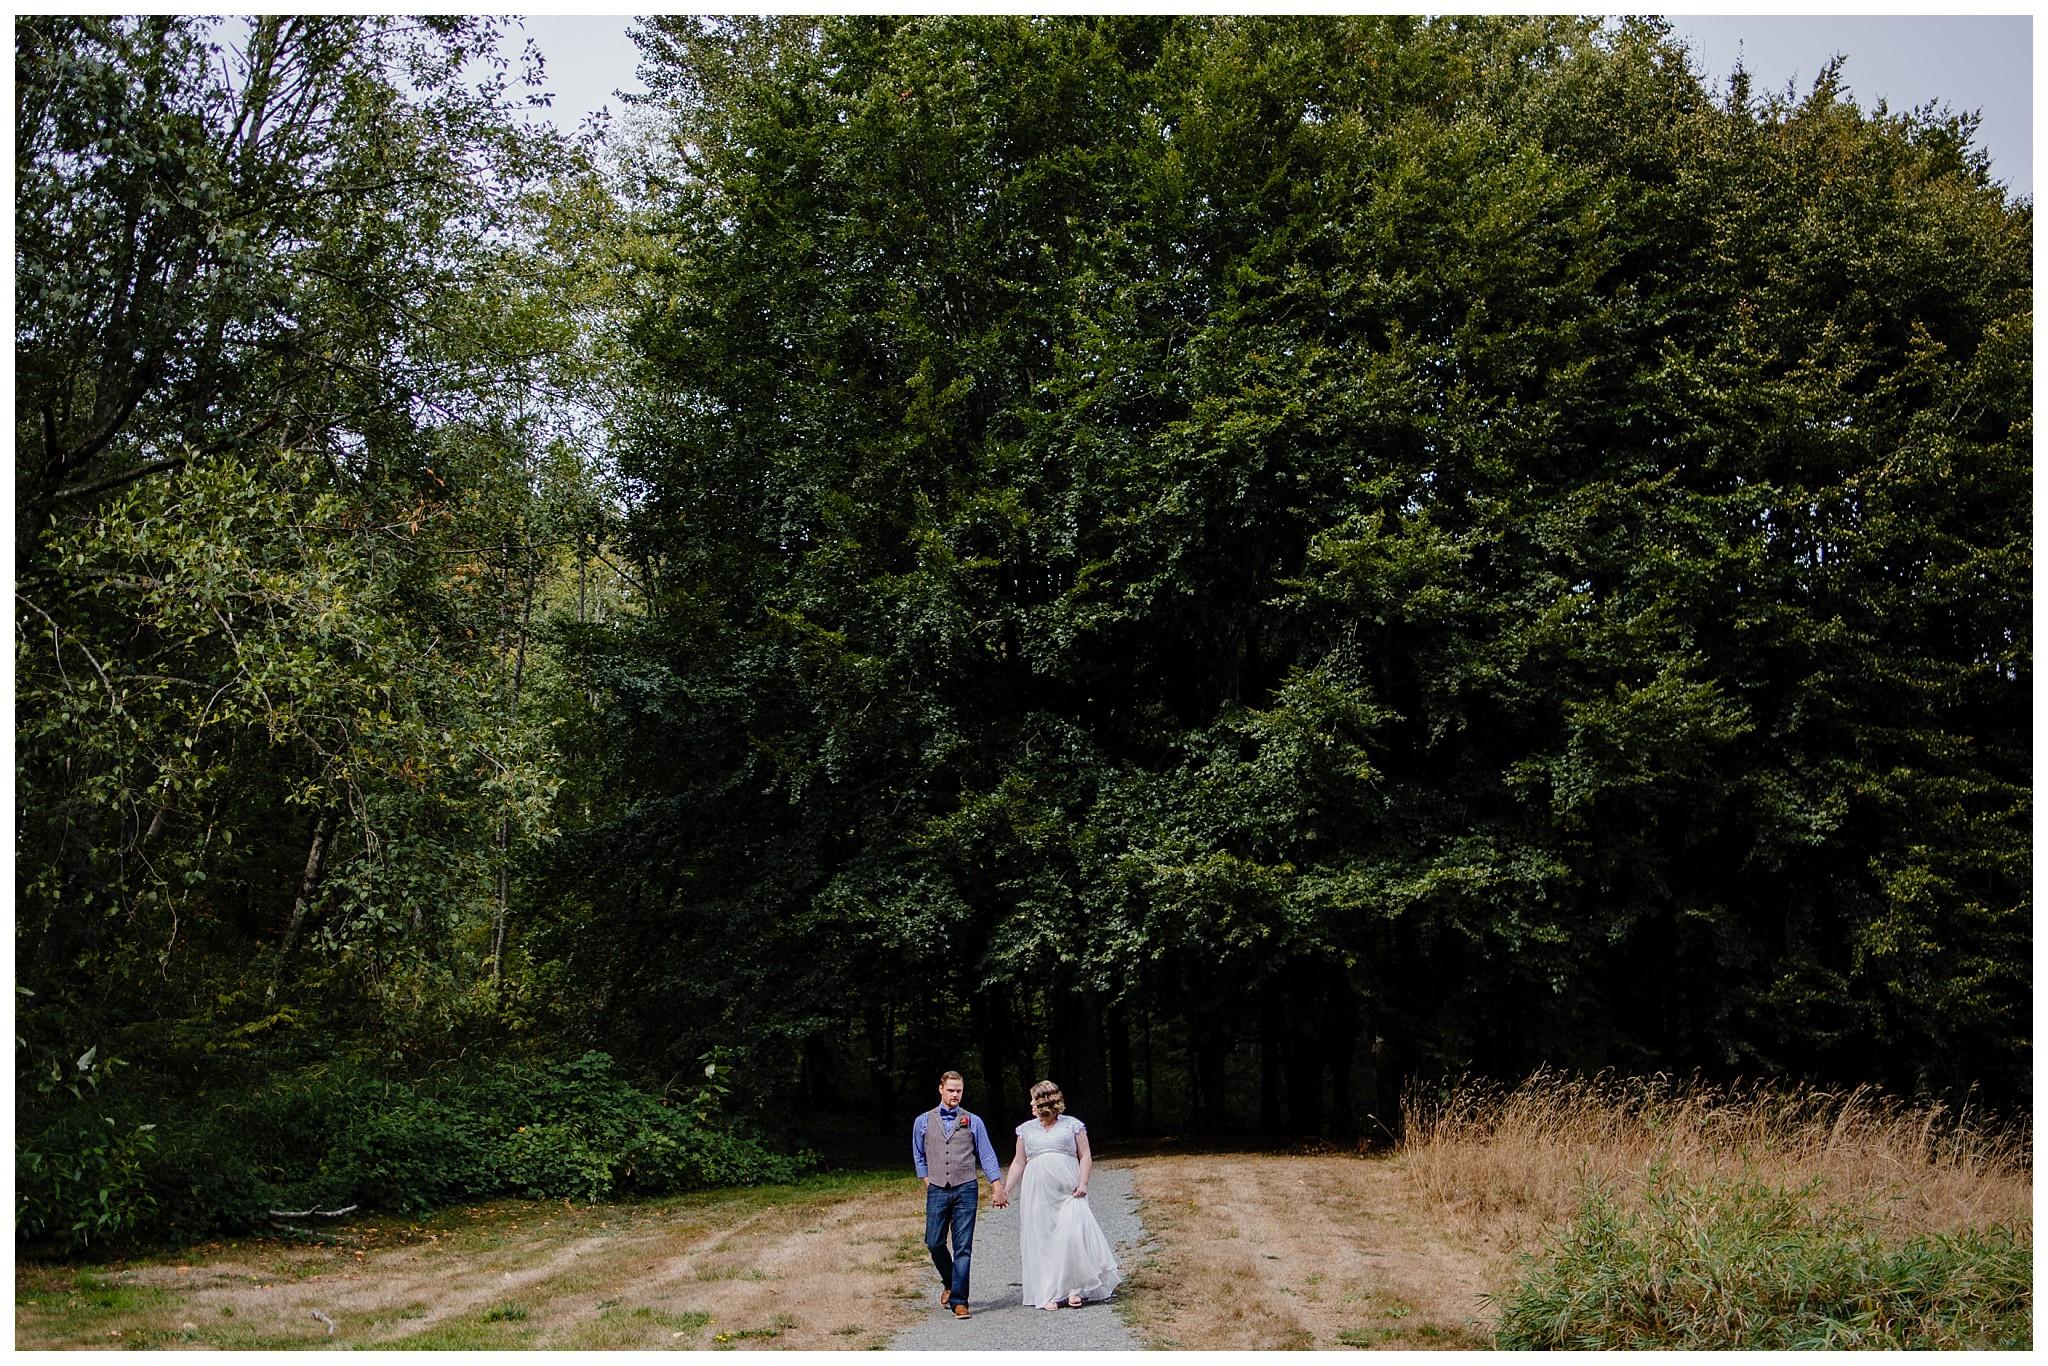 Aldergrove Park Fall Backyard Wedding Photographer Pregnant Bride Tent Outdoor BC Canada Best Wedding Photographer_0031.jpg